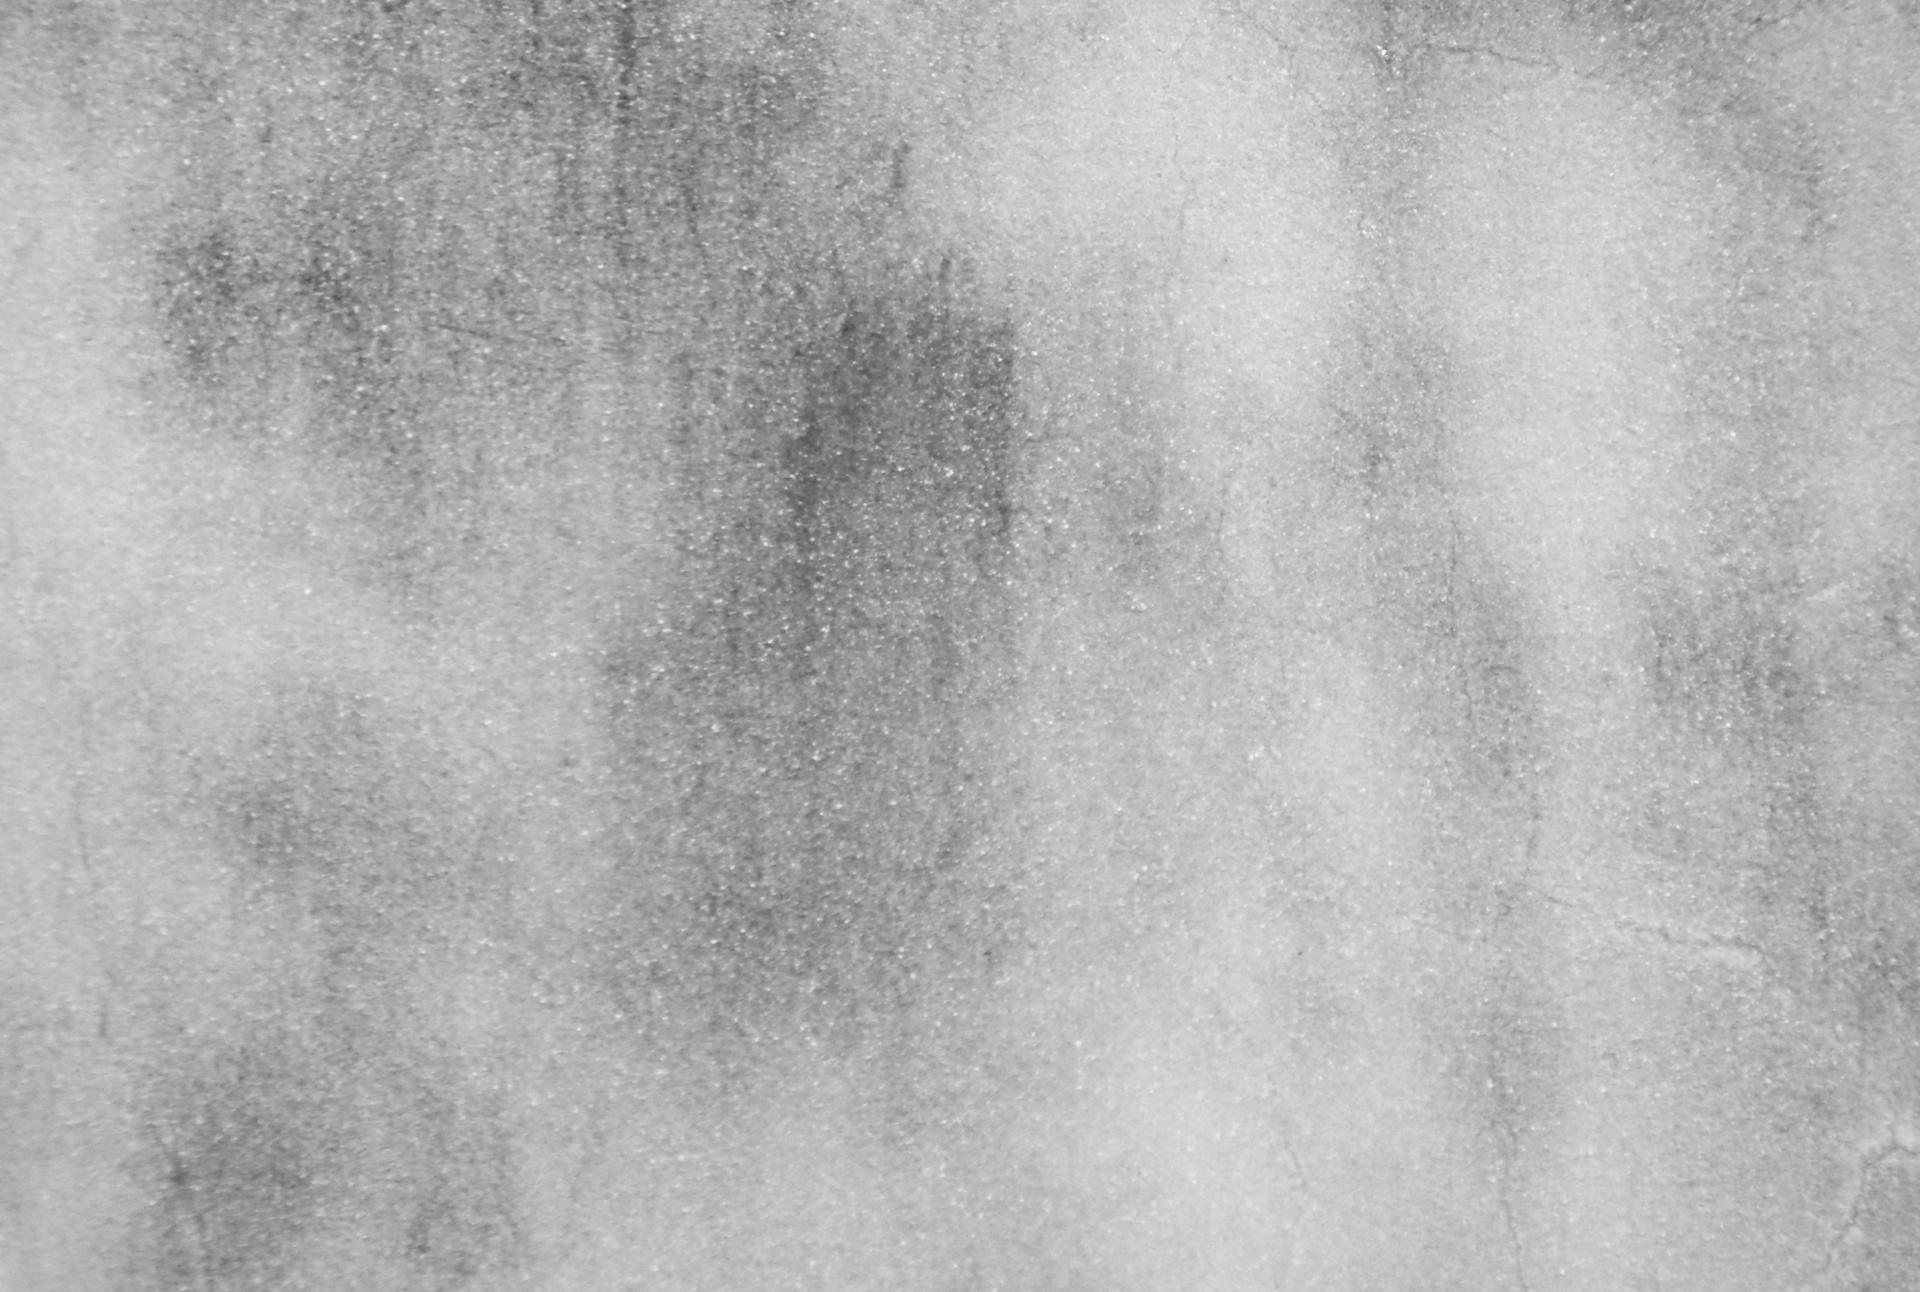 Black Textured Wallpaper Grey Concrete Texture Free Stock Photo Public Domain